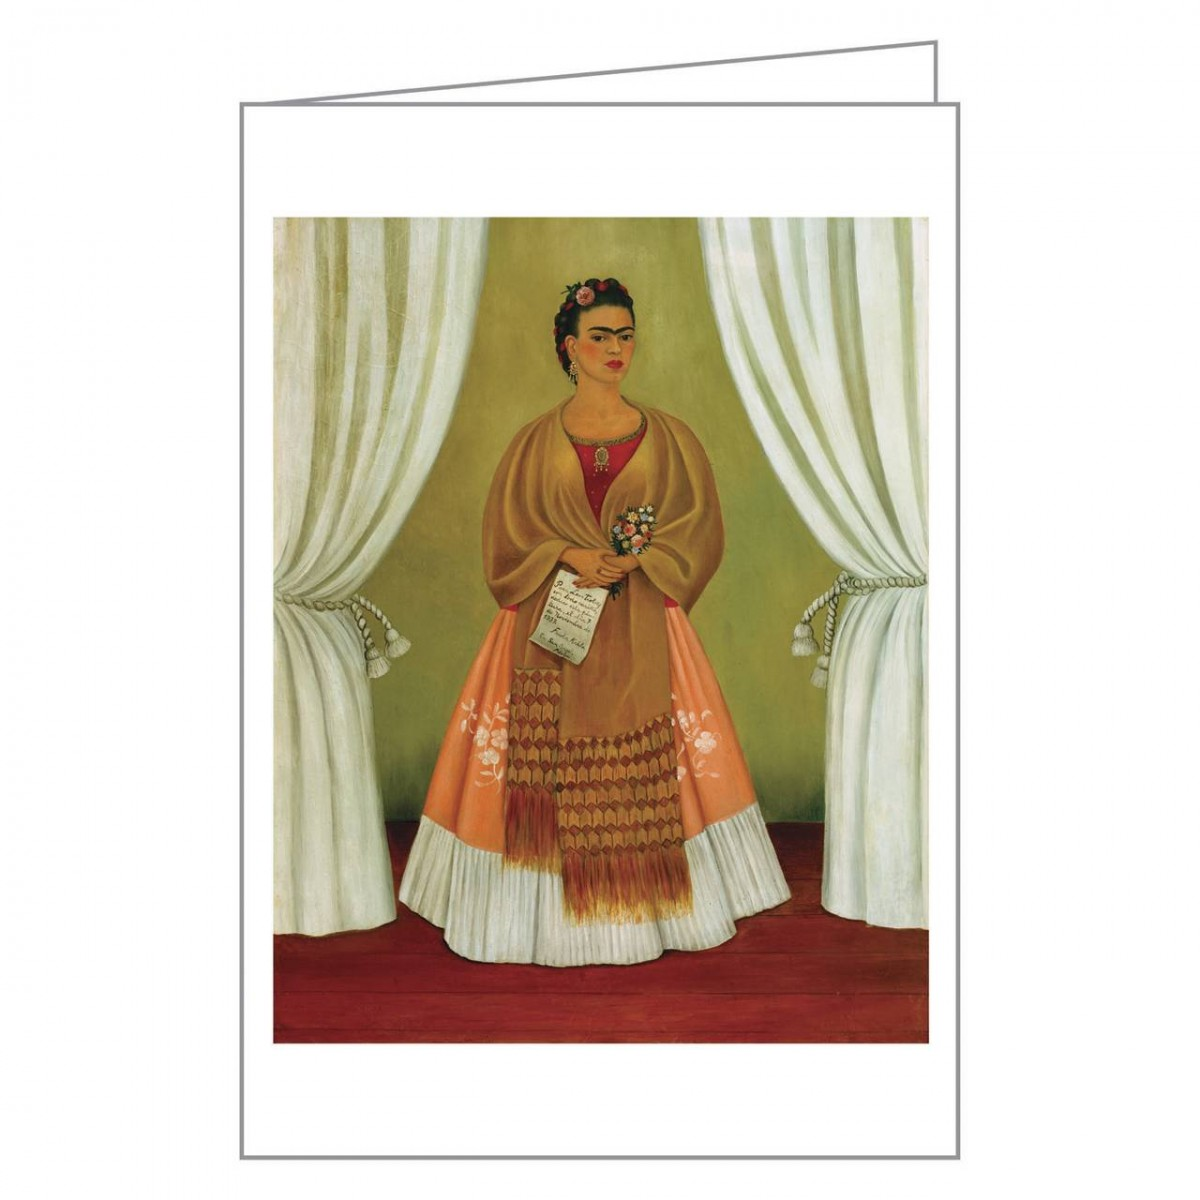 Frida Kahlo Notecard Box